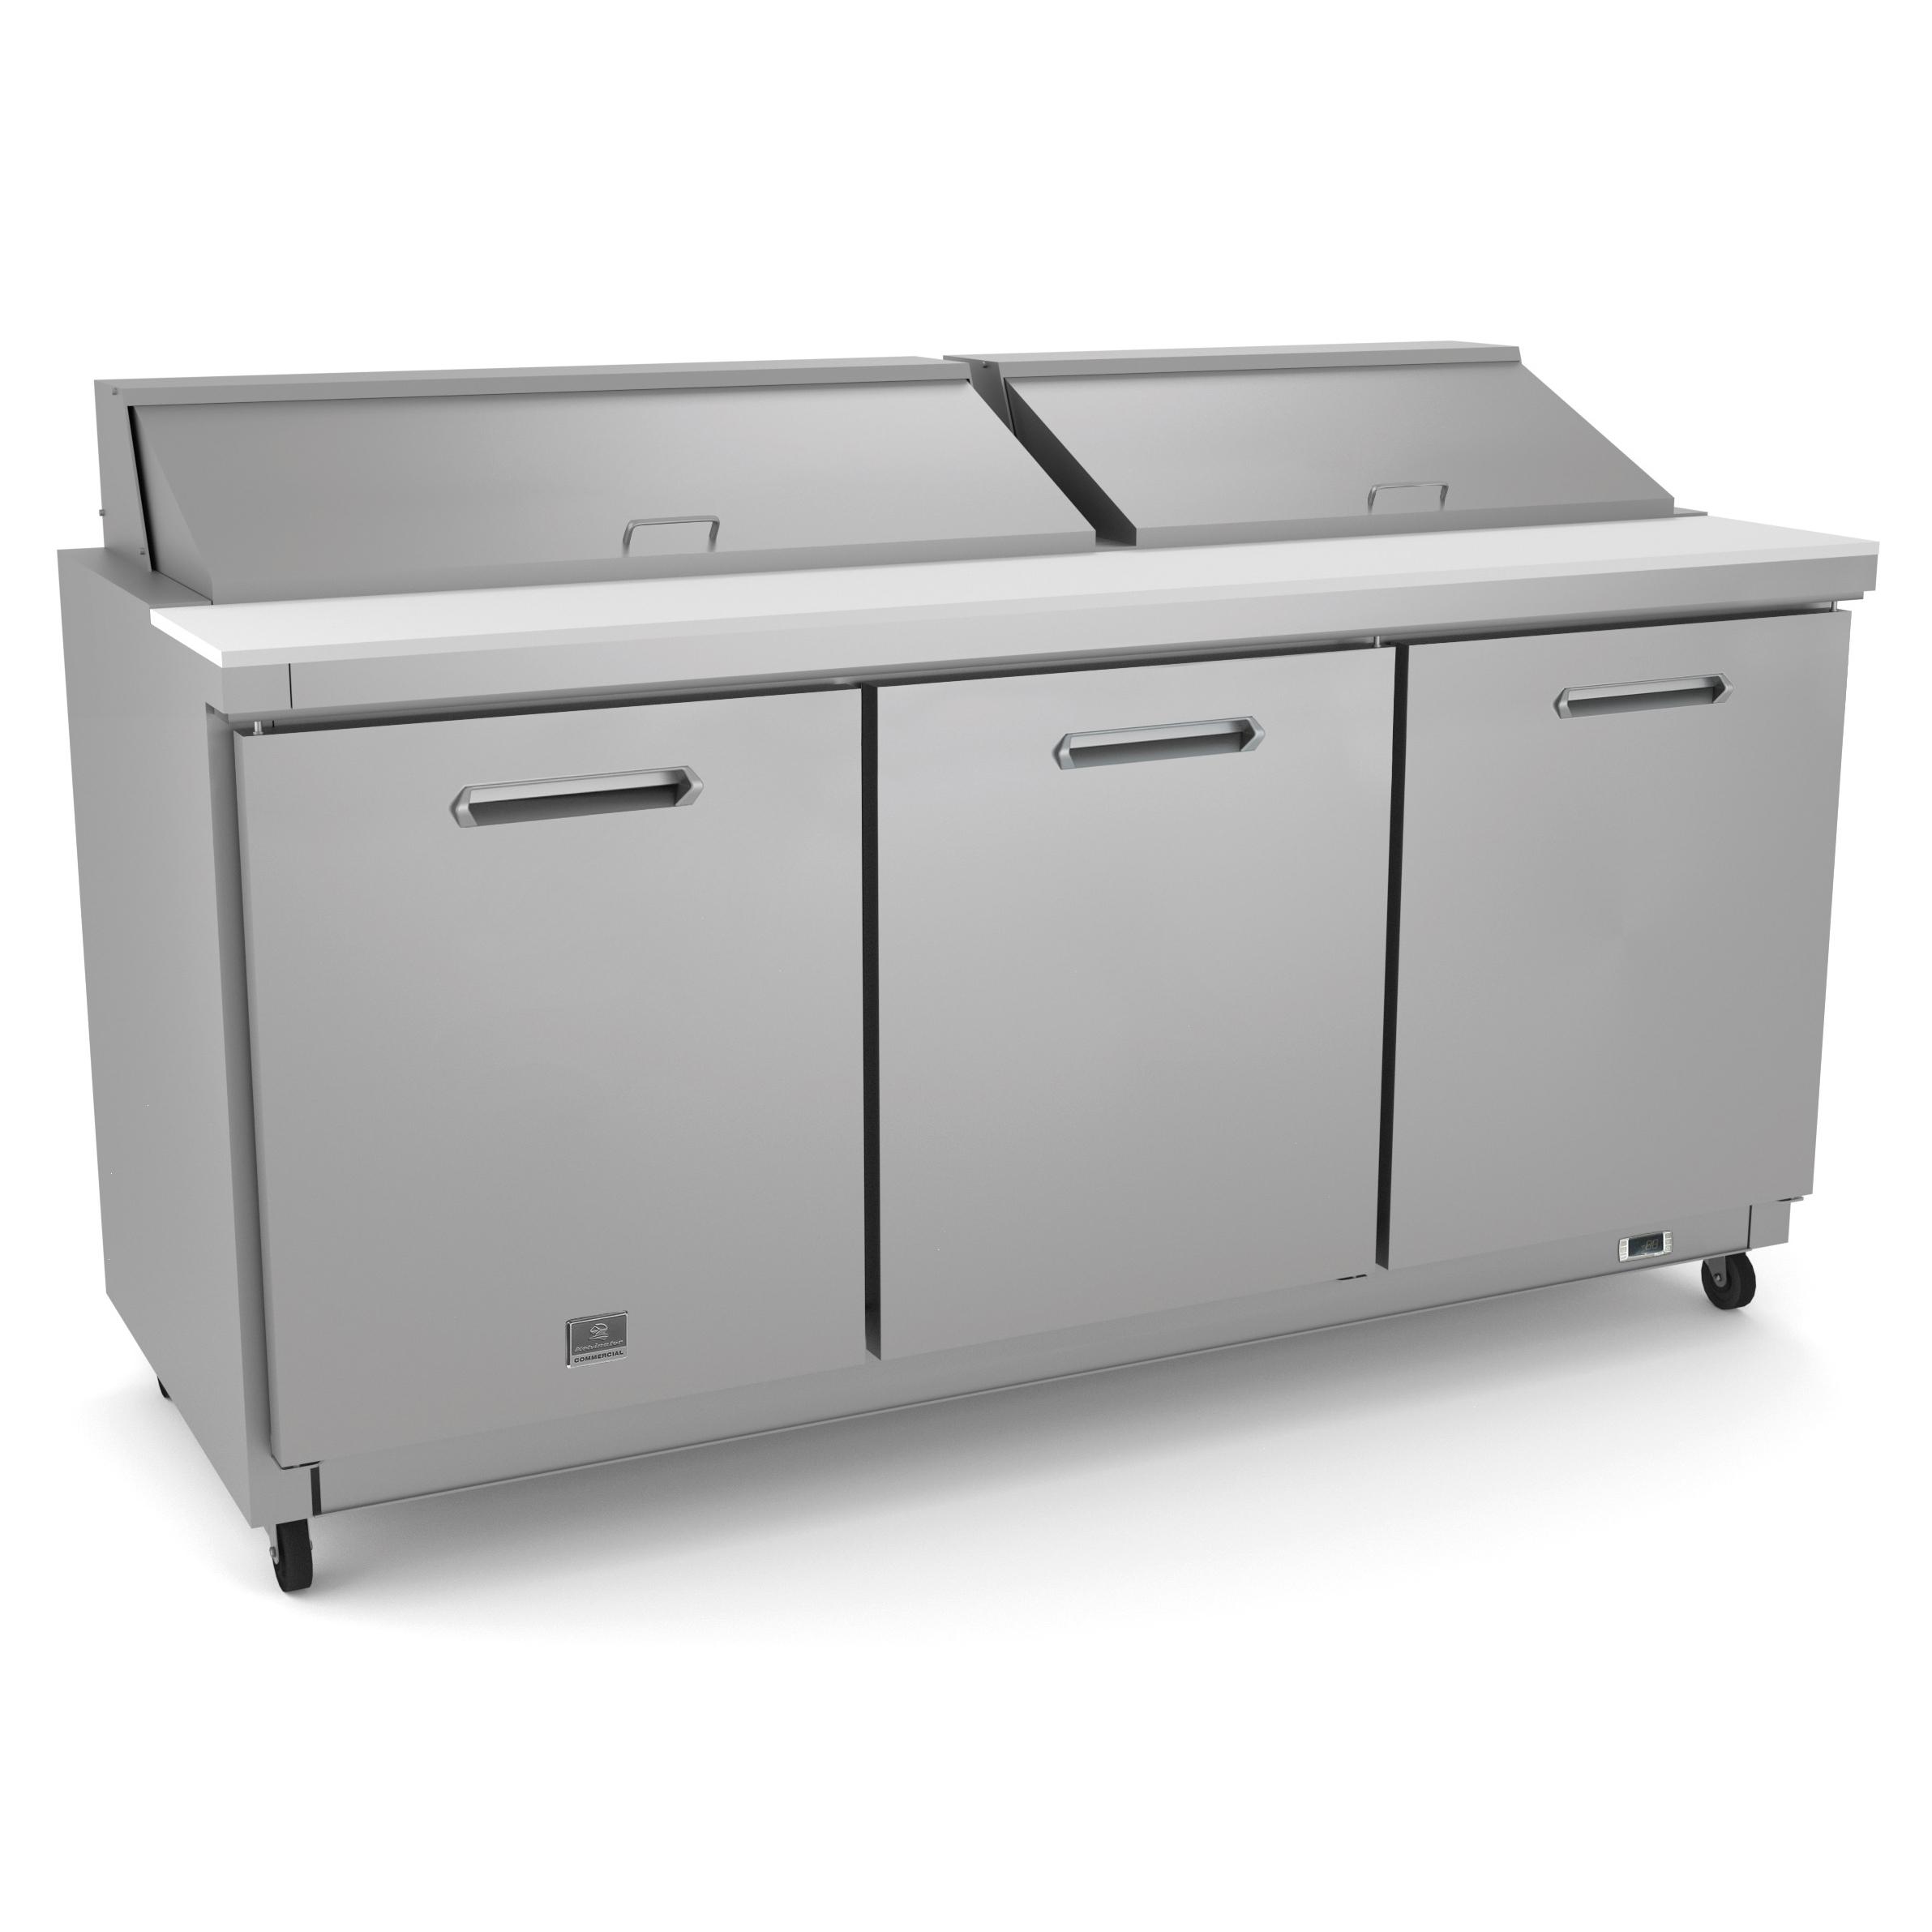 Kelvinator Commercial KCHST70.18 refrigerated counter, sandwich / salad unit